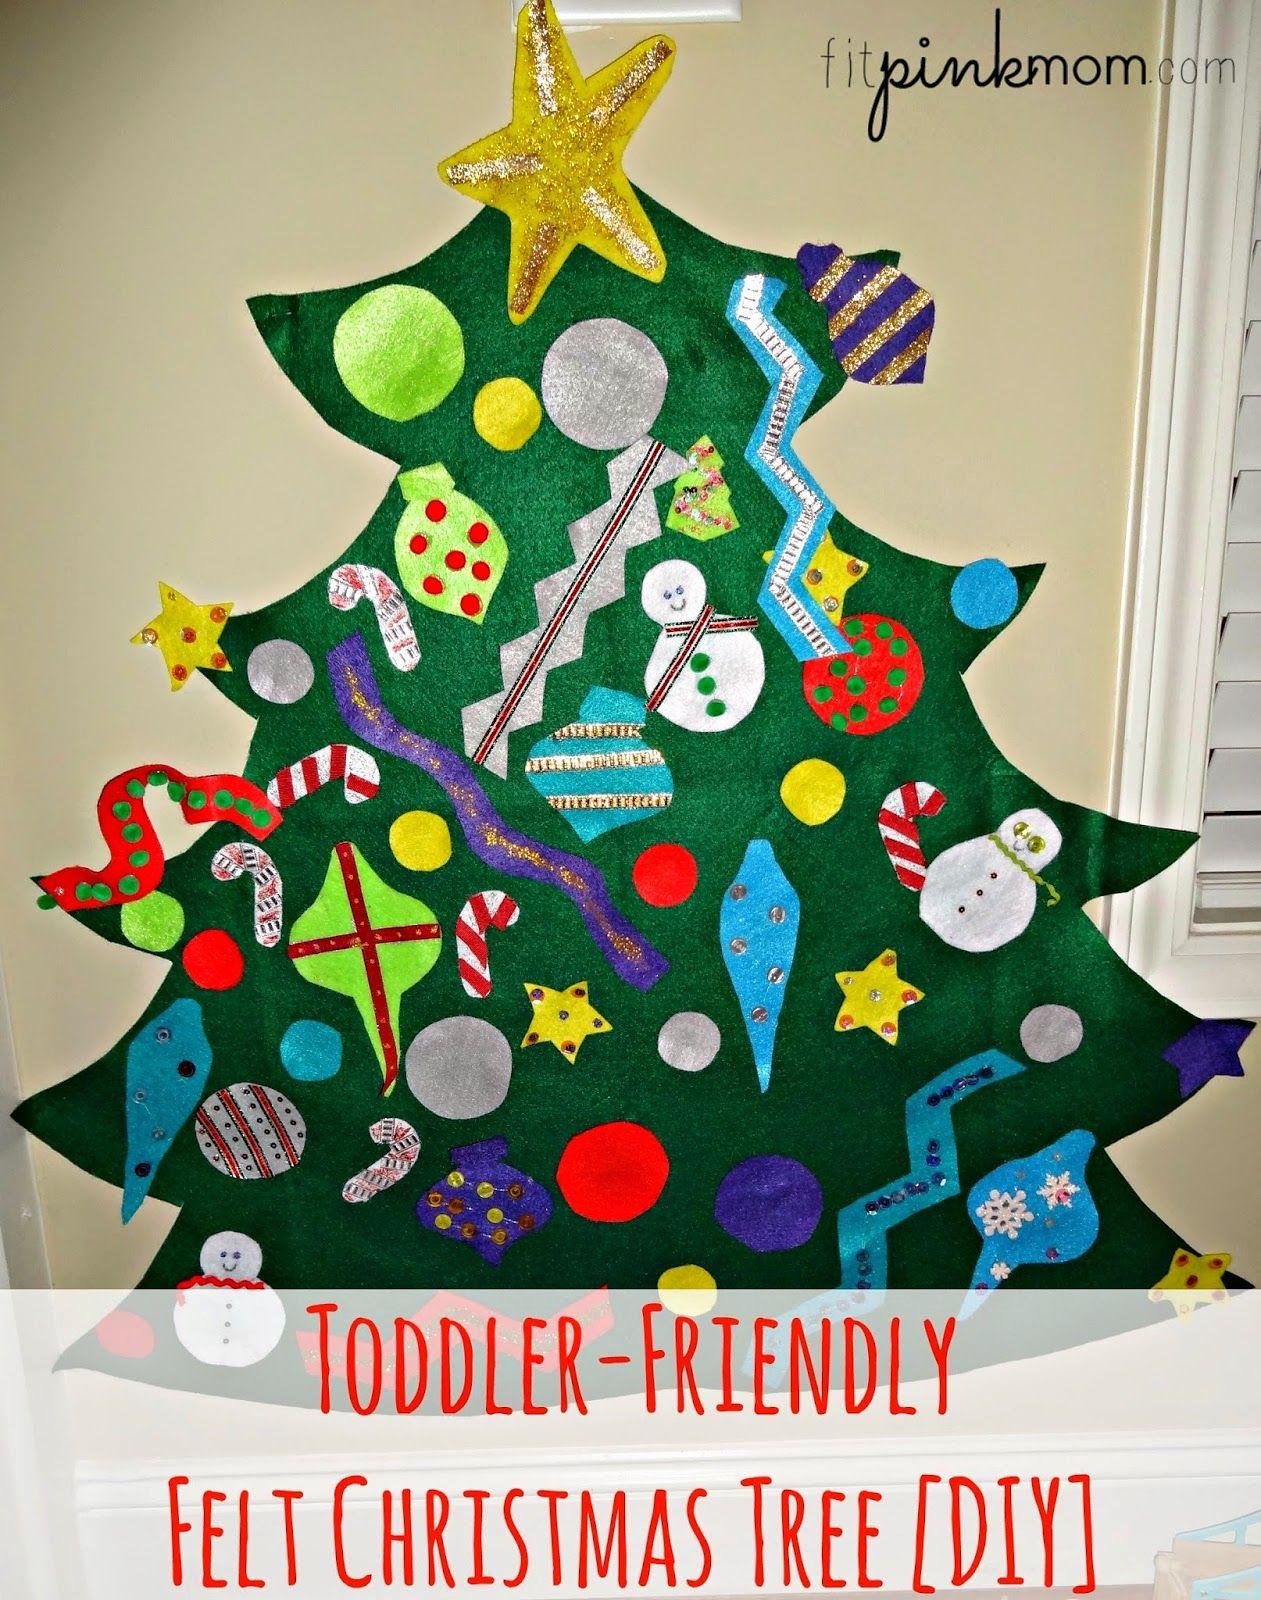 Toddler Friendly Felt Christmas Tree [Diy] #Felttree #Diy #Christmascraft #